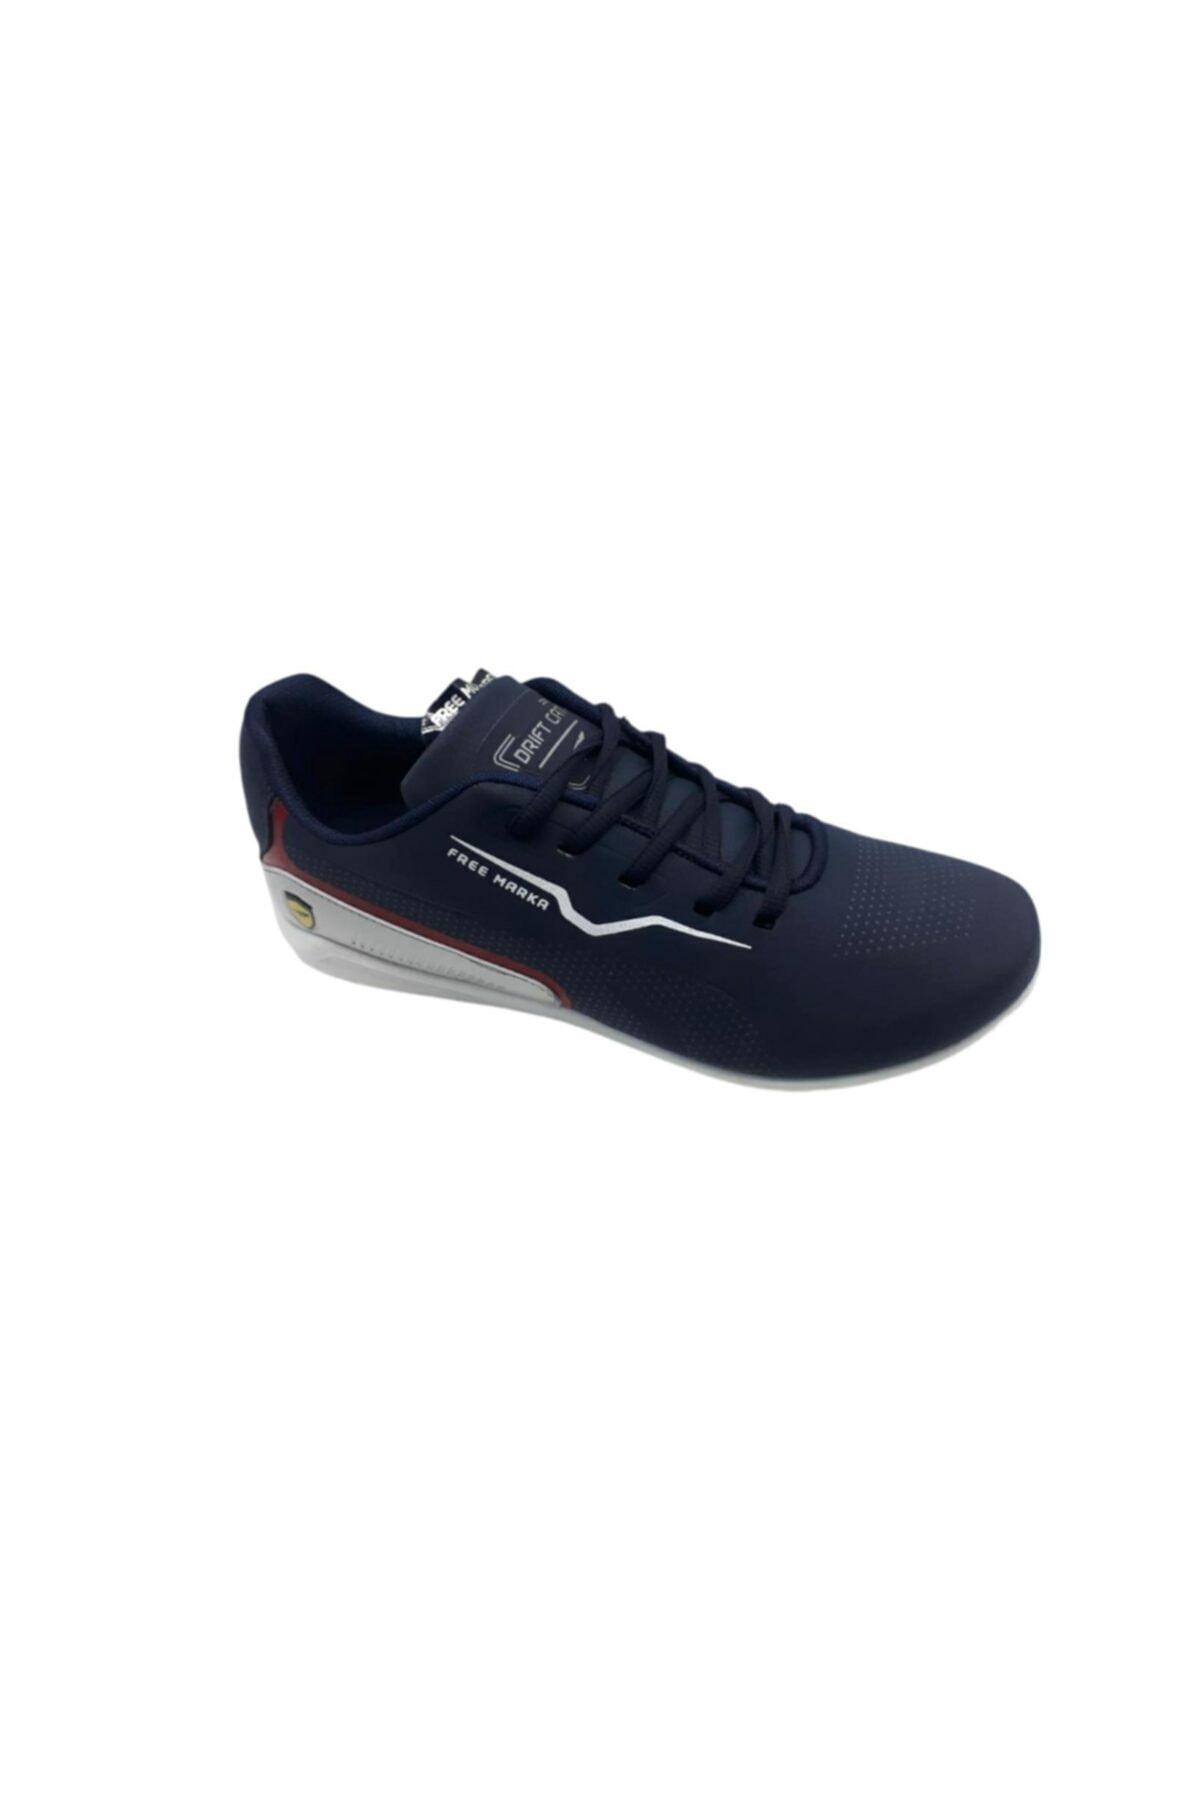 خرید کفش والیبال مردانه شیک مجلسی برند FREE MARKA رنگ لاجوردی کد ty97807567